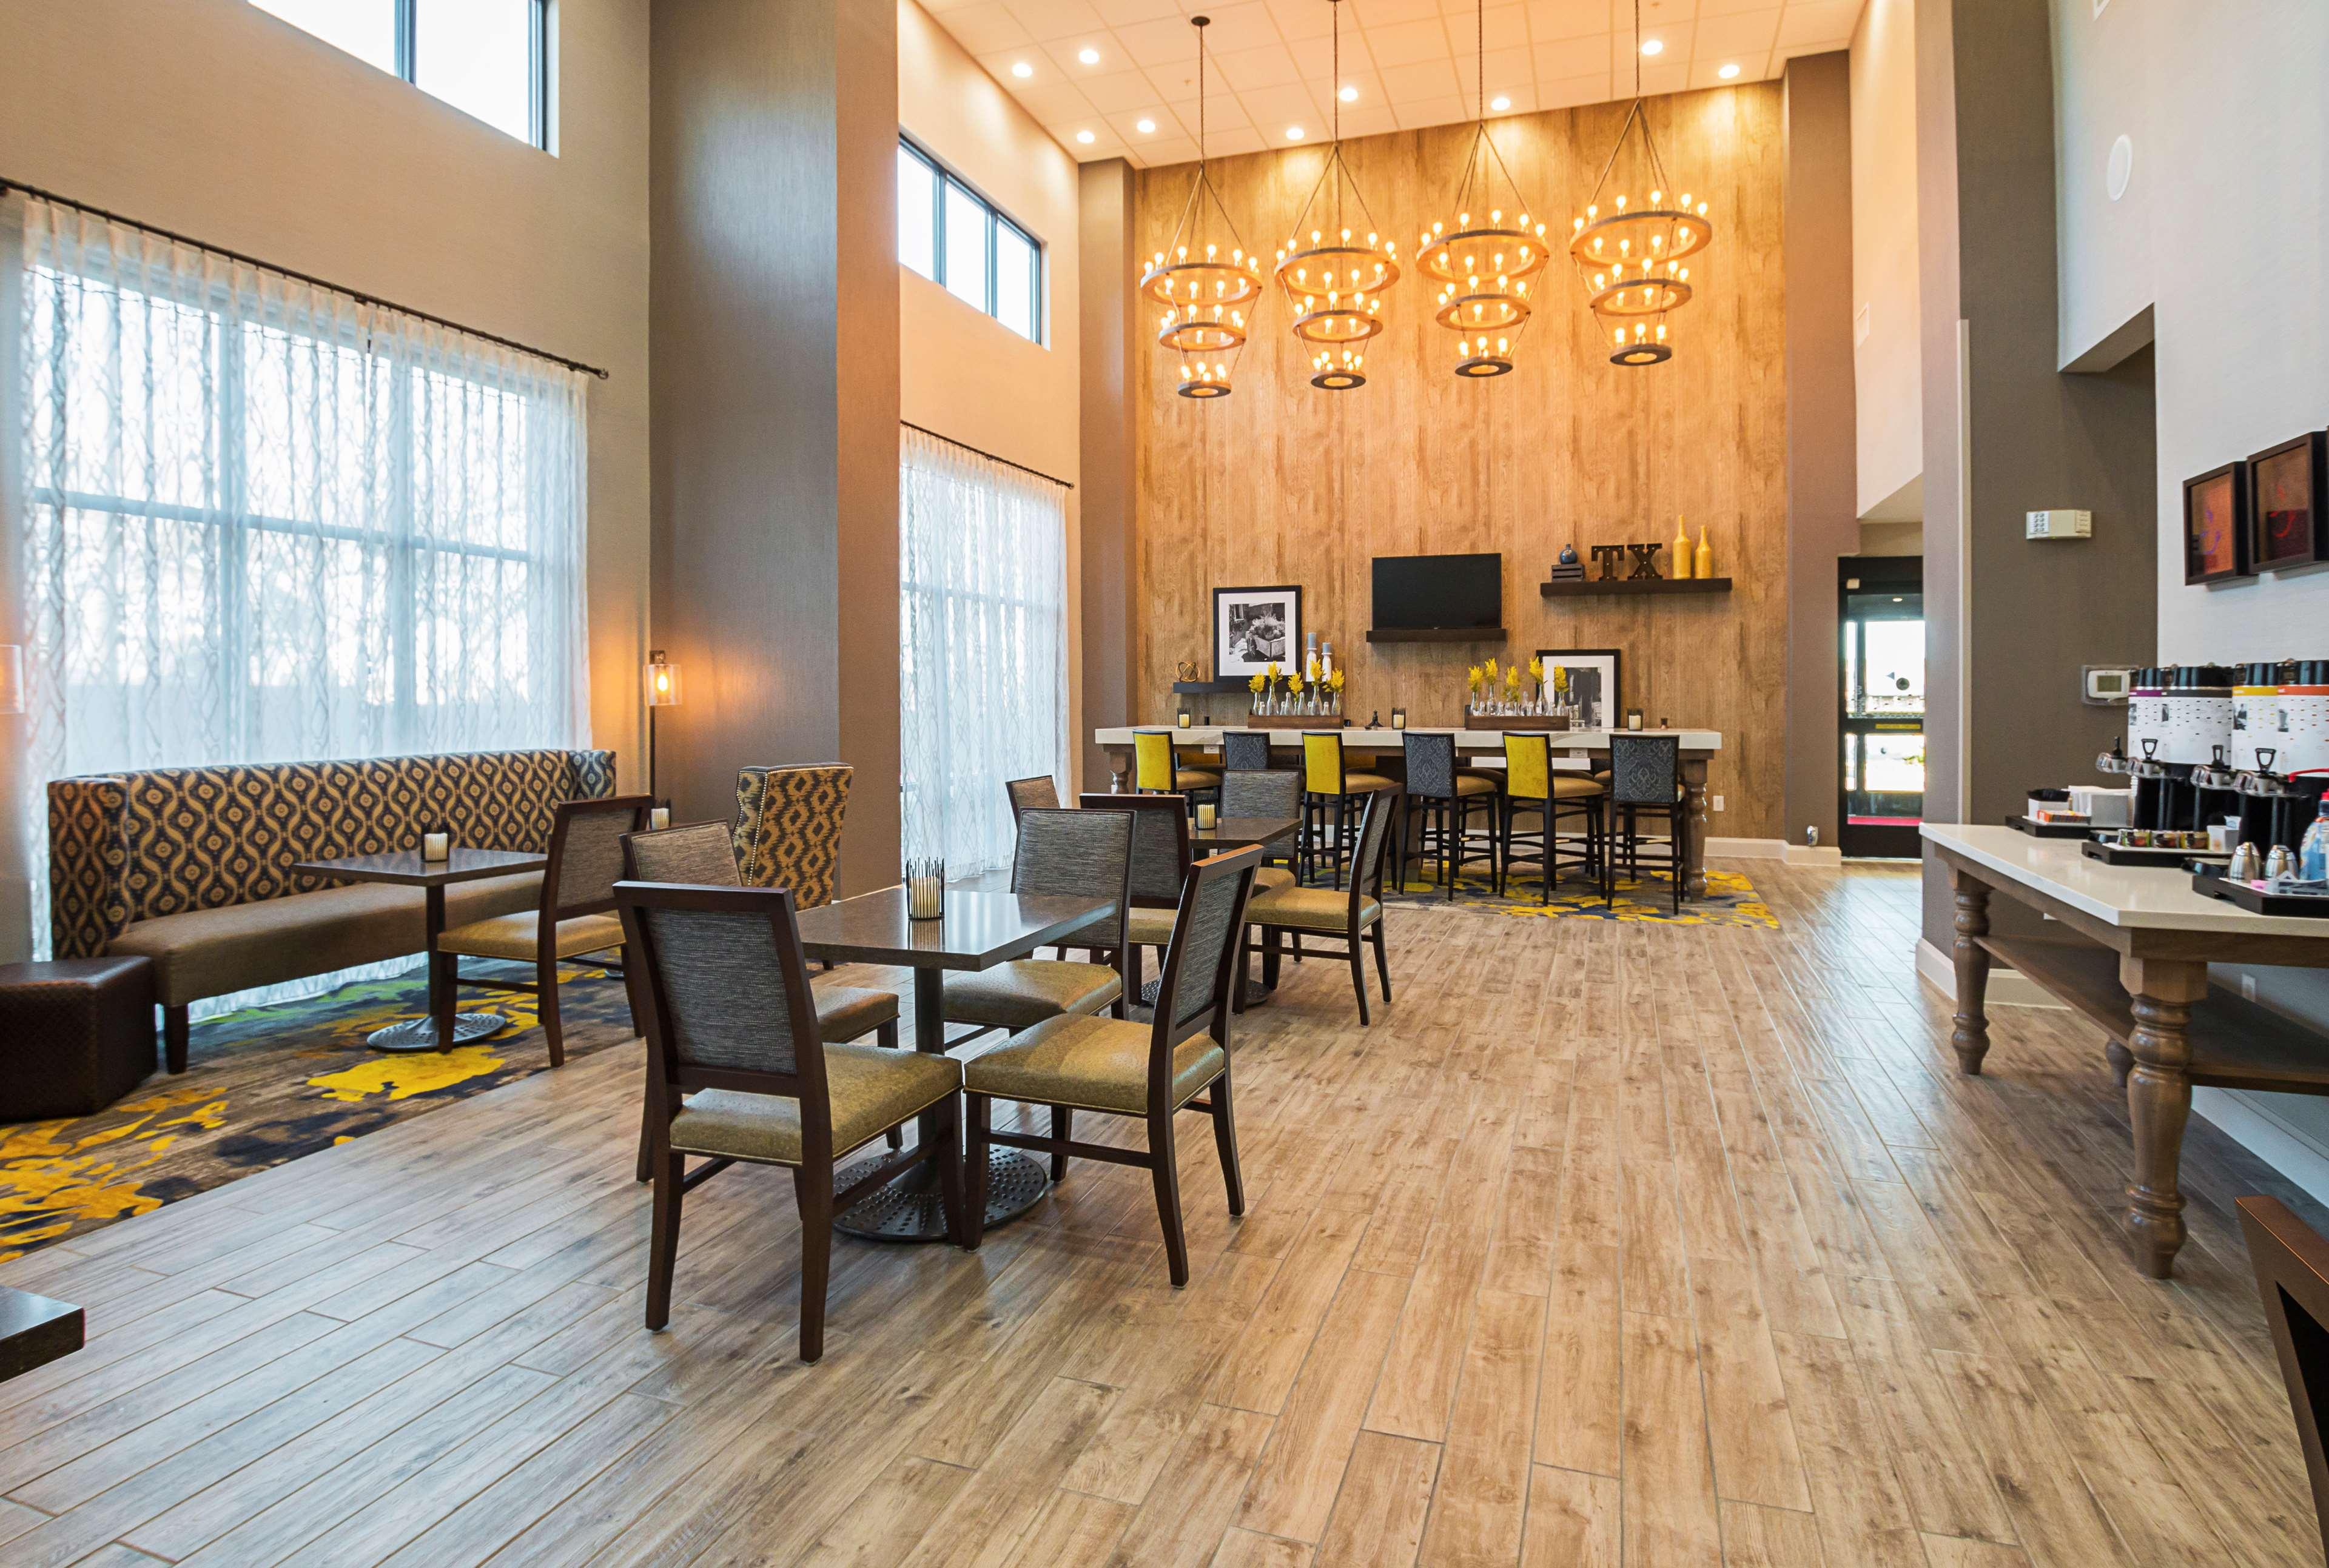 Hampton Inn & Suites Colleyville DFW West image 17